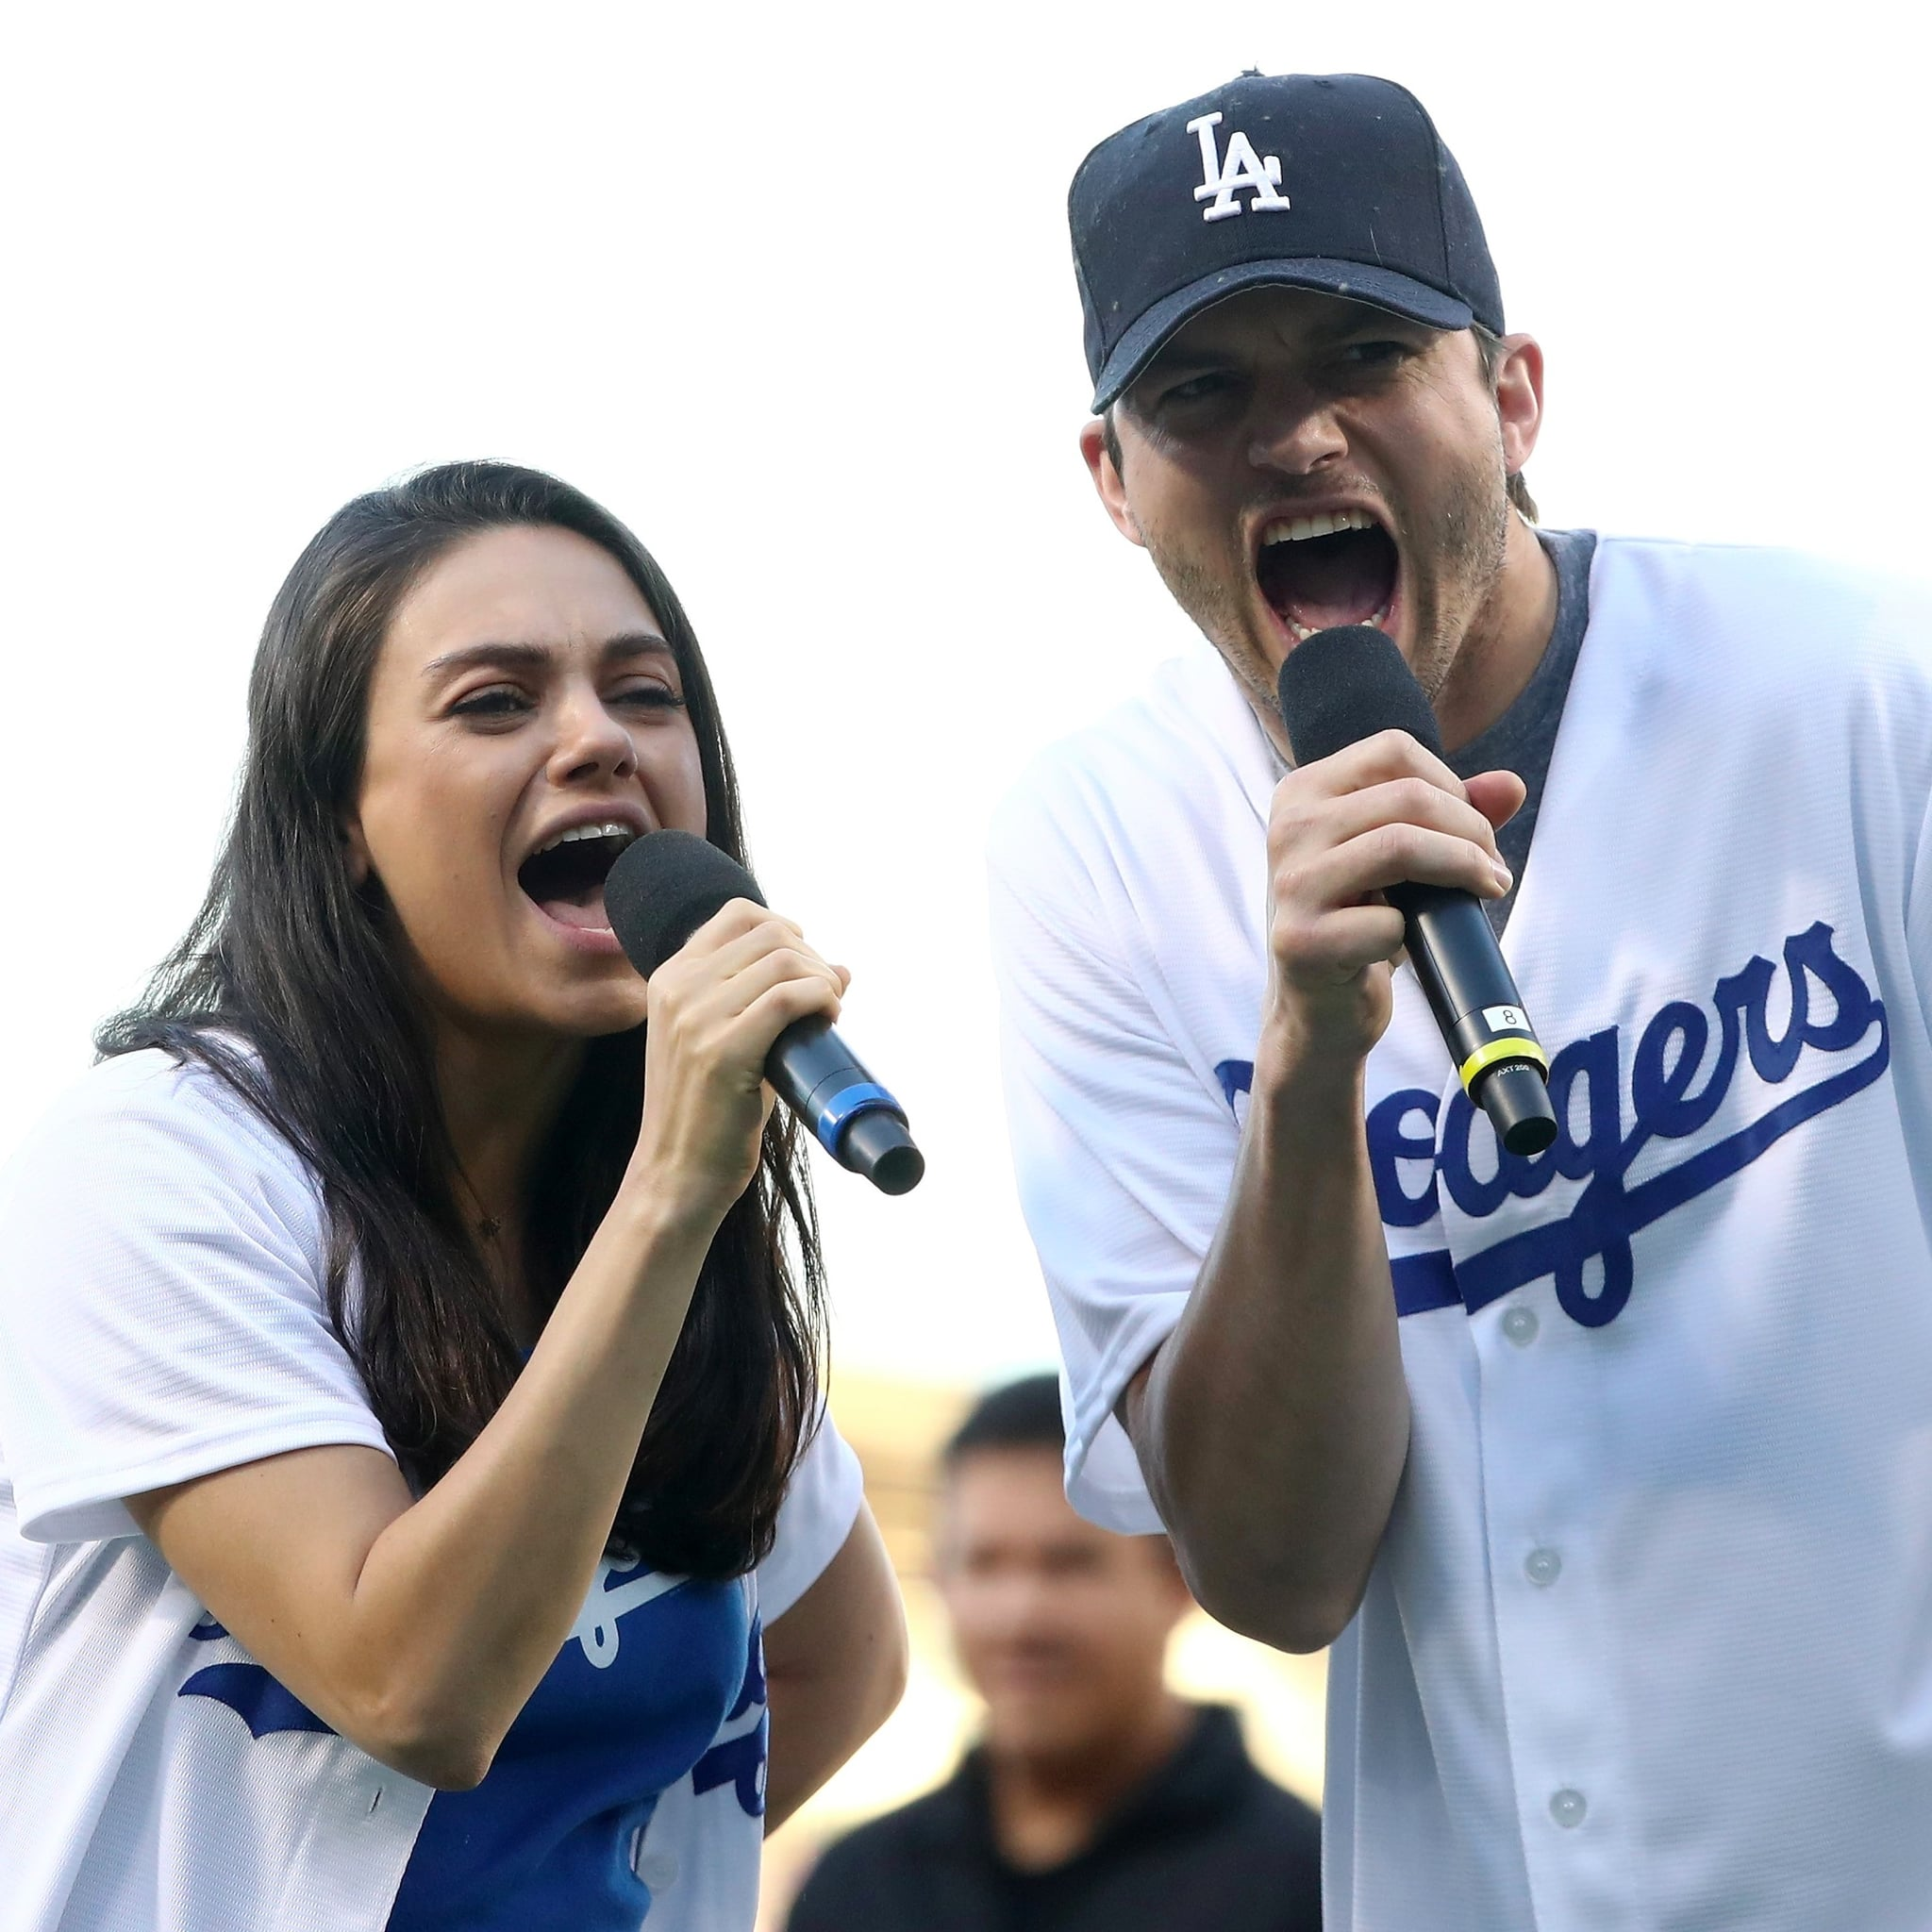 Ashton Kutcher And Mila Kunis At La Dodgers Game Oct 2016